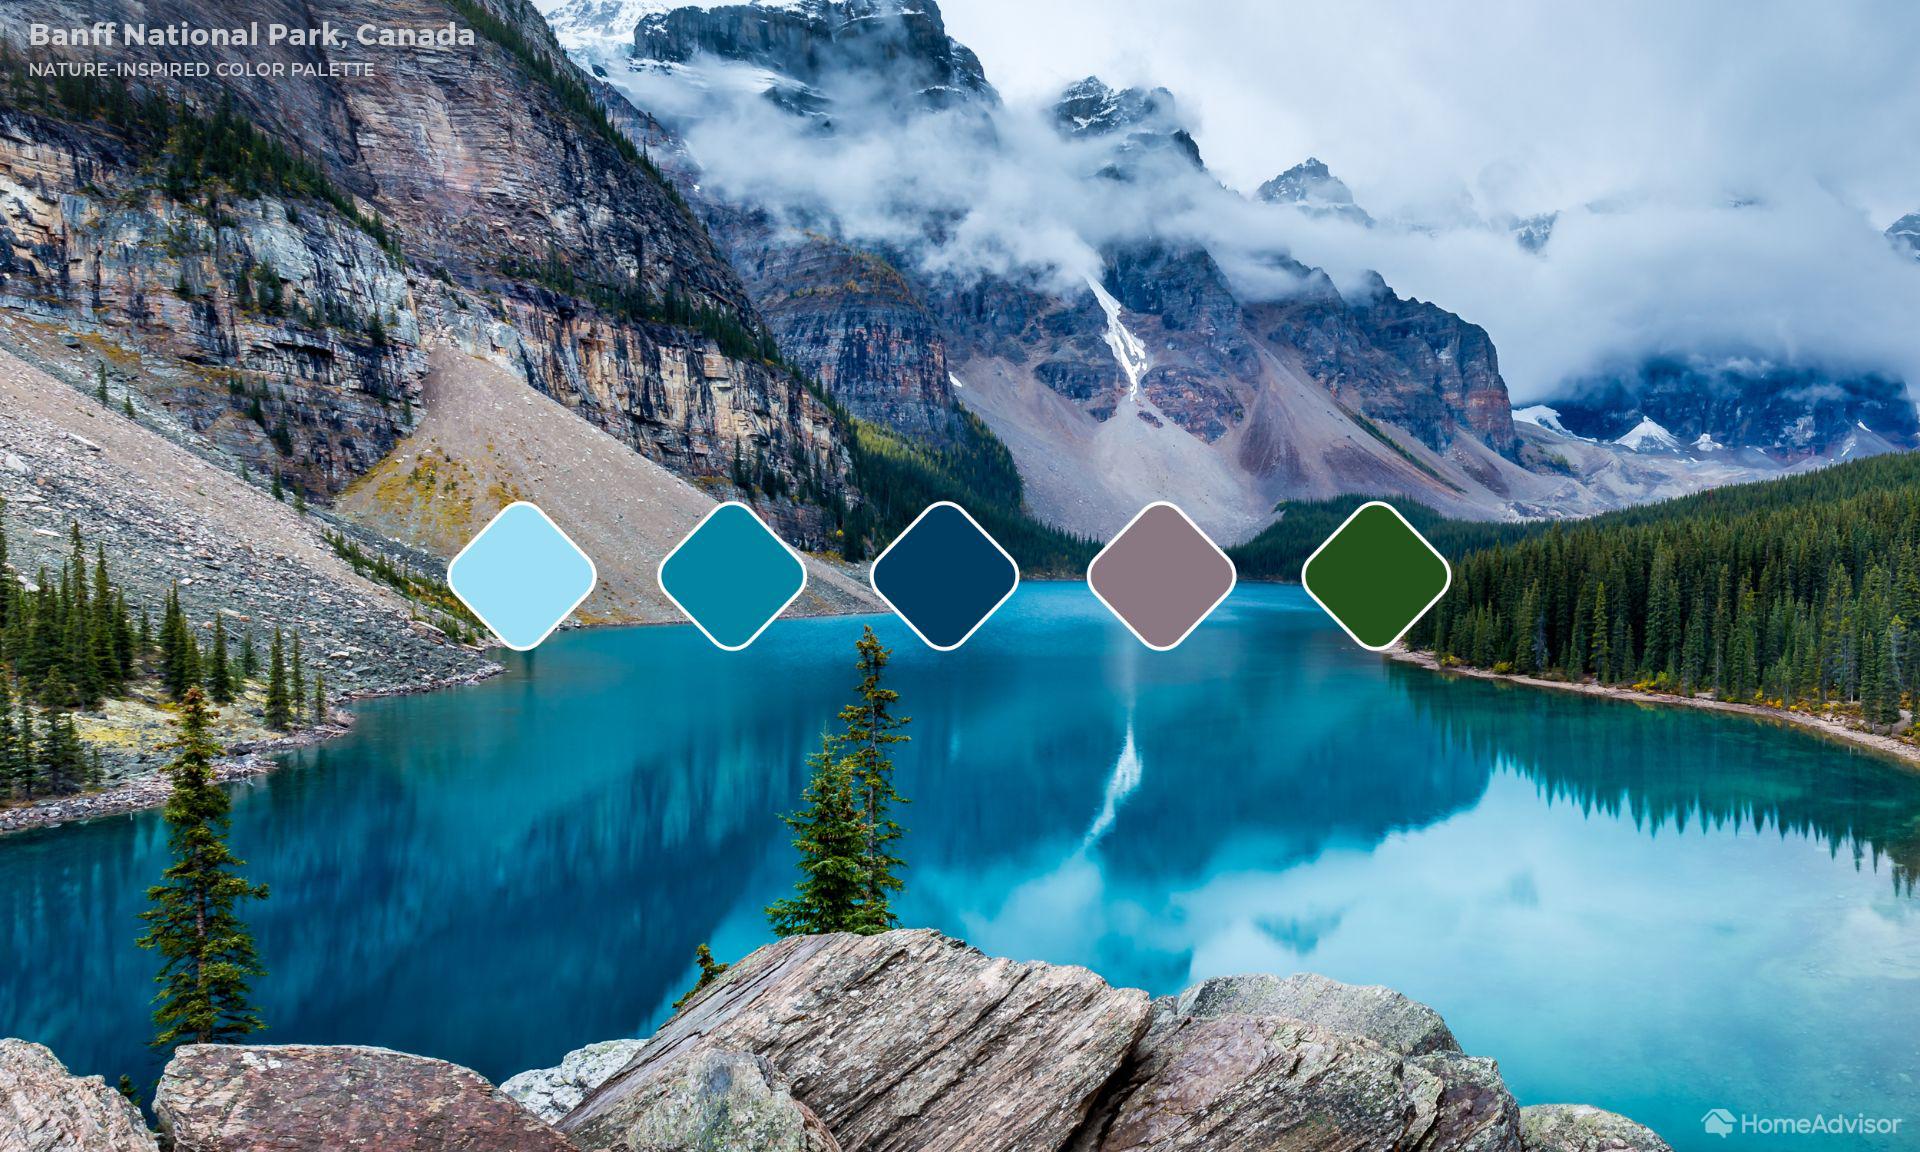 5. Banff National Park (Alberta, Canadá)